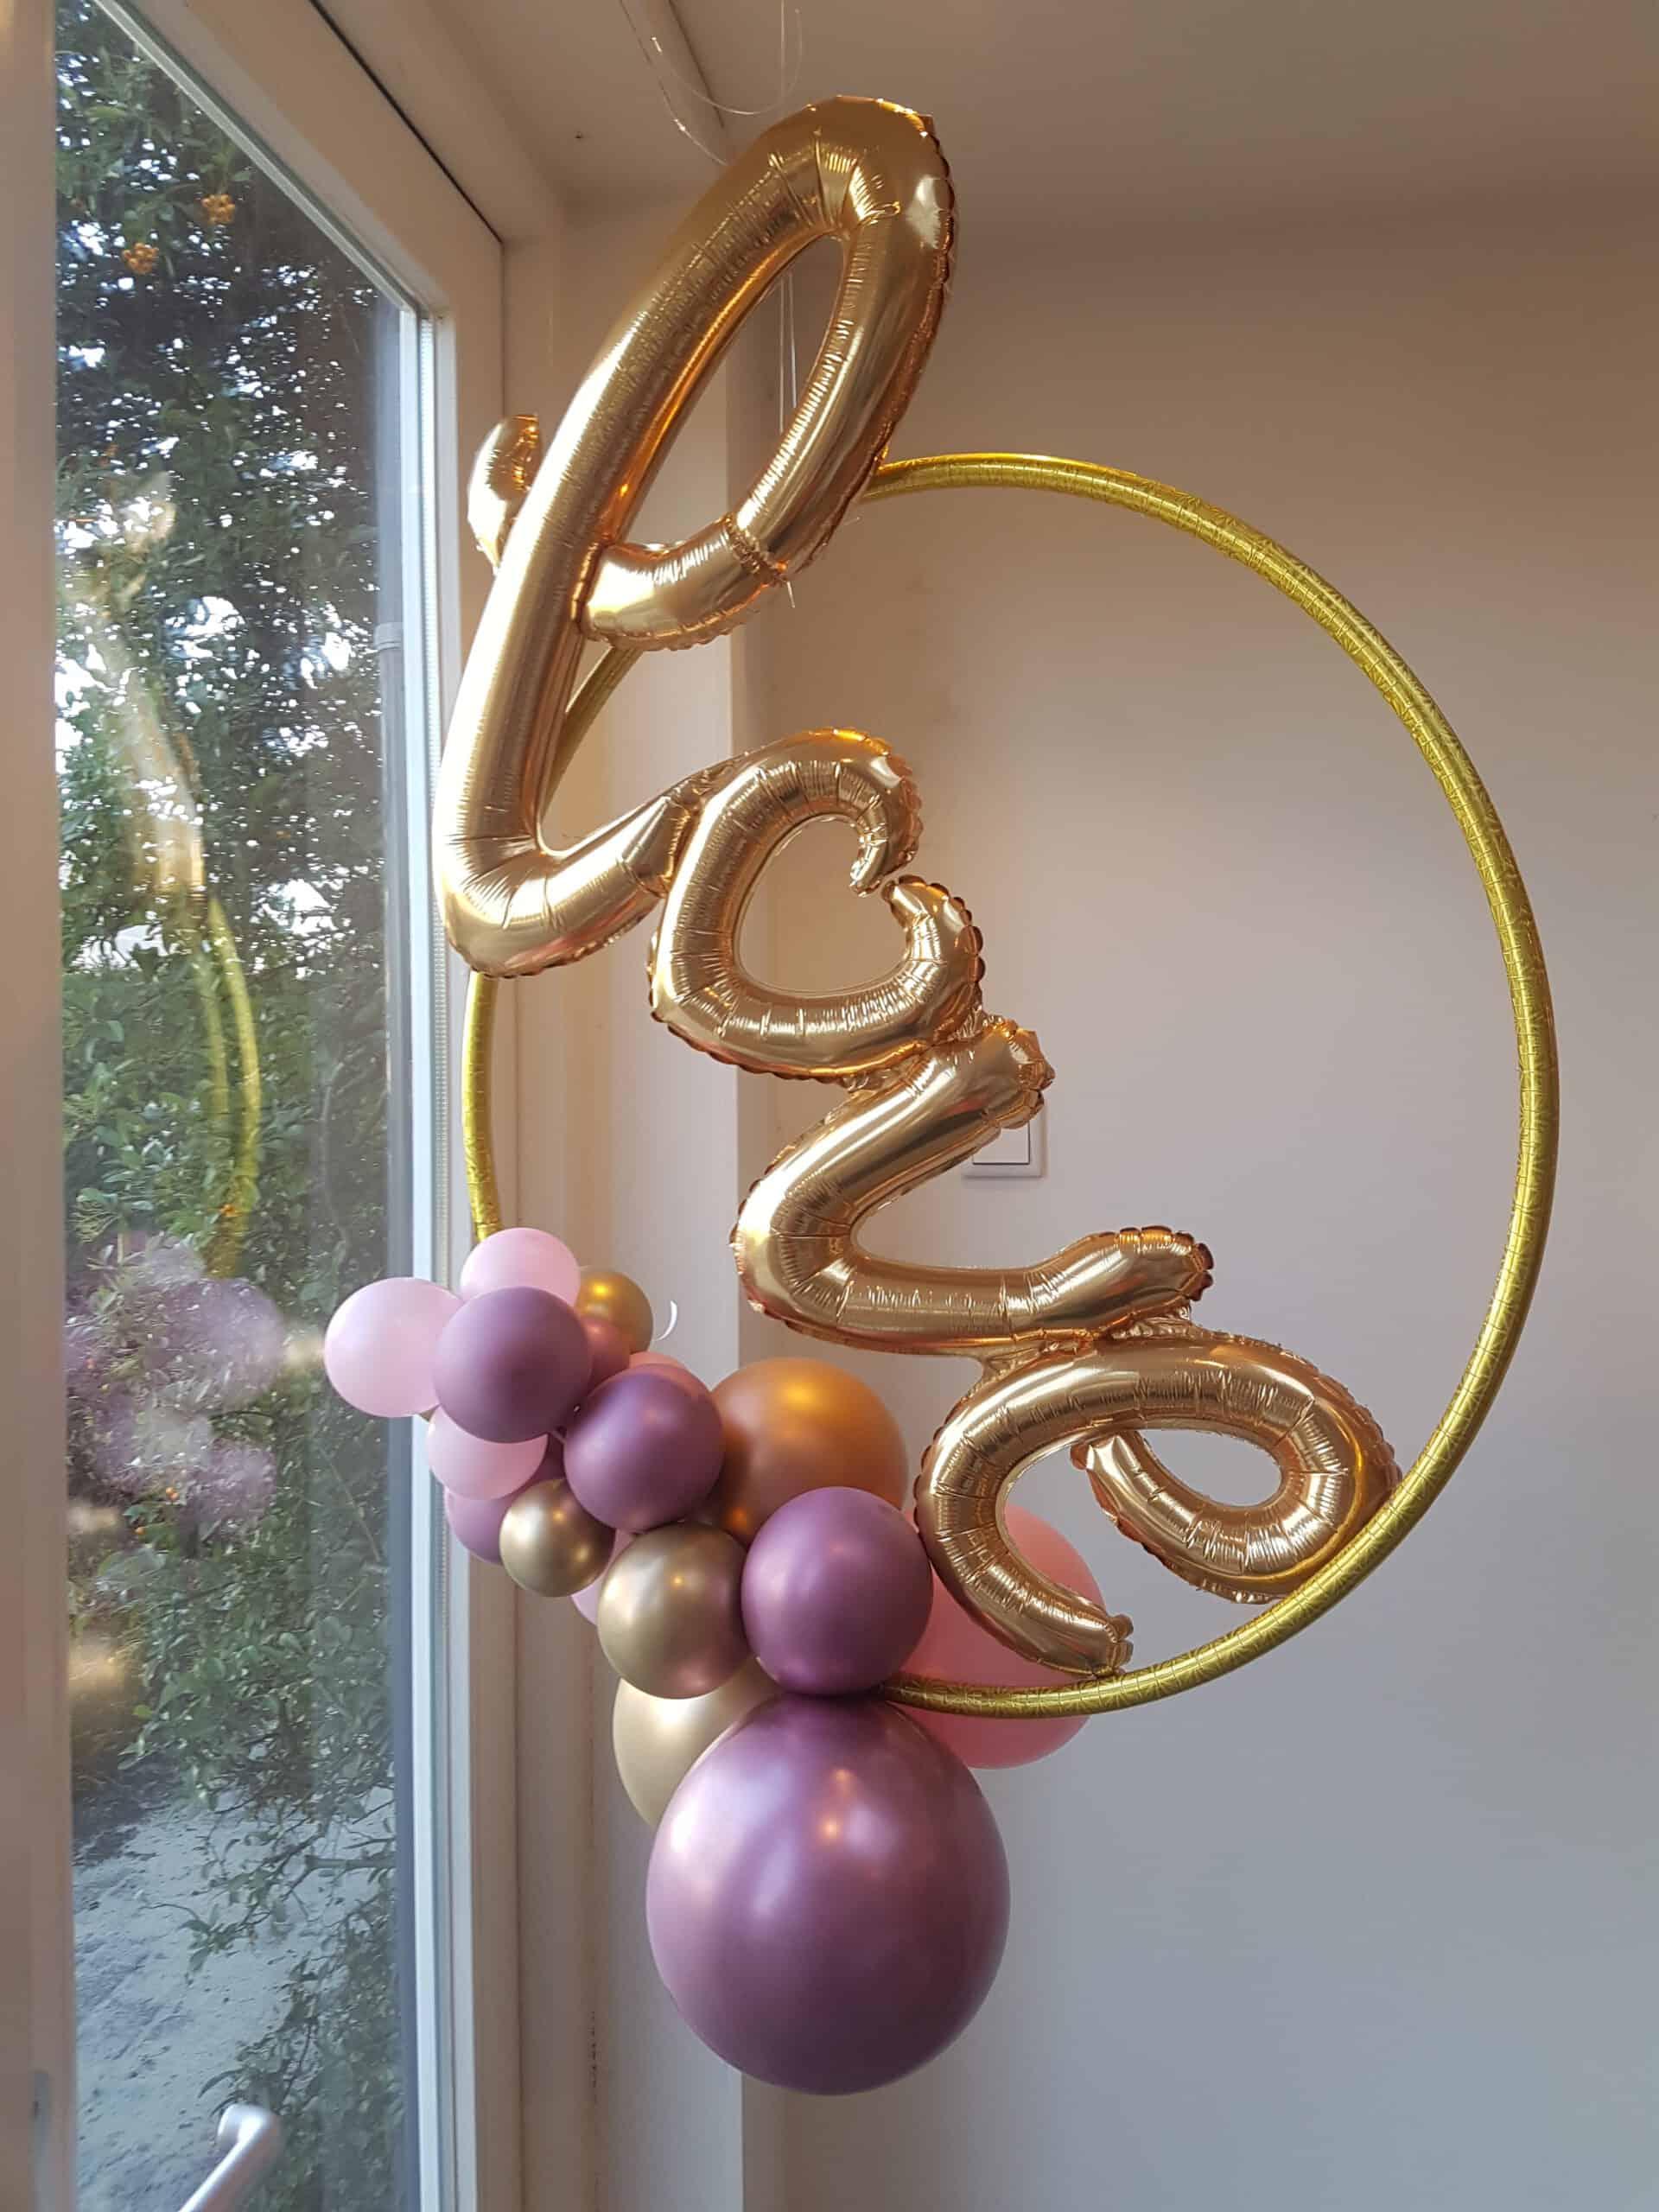 20200201 141642 scaled - Organic ballondecoratie van allerlei maten ballonnen